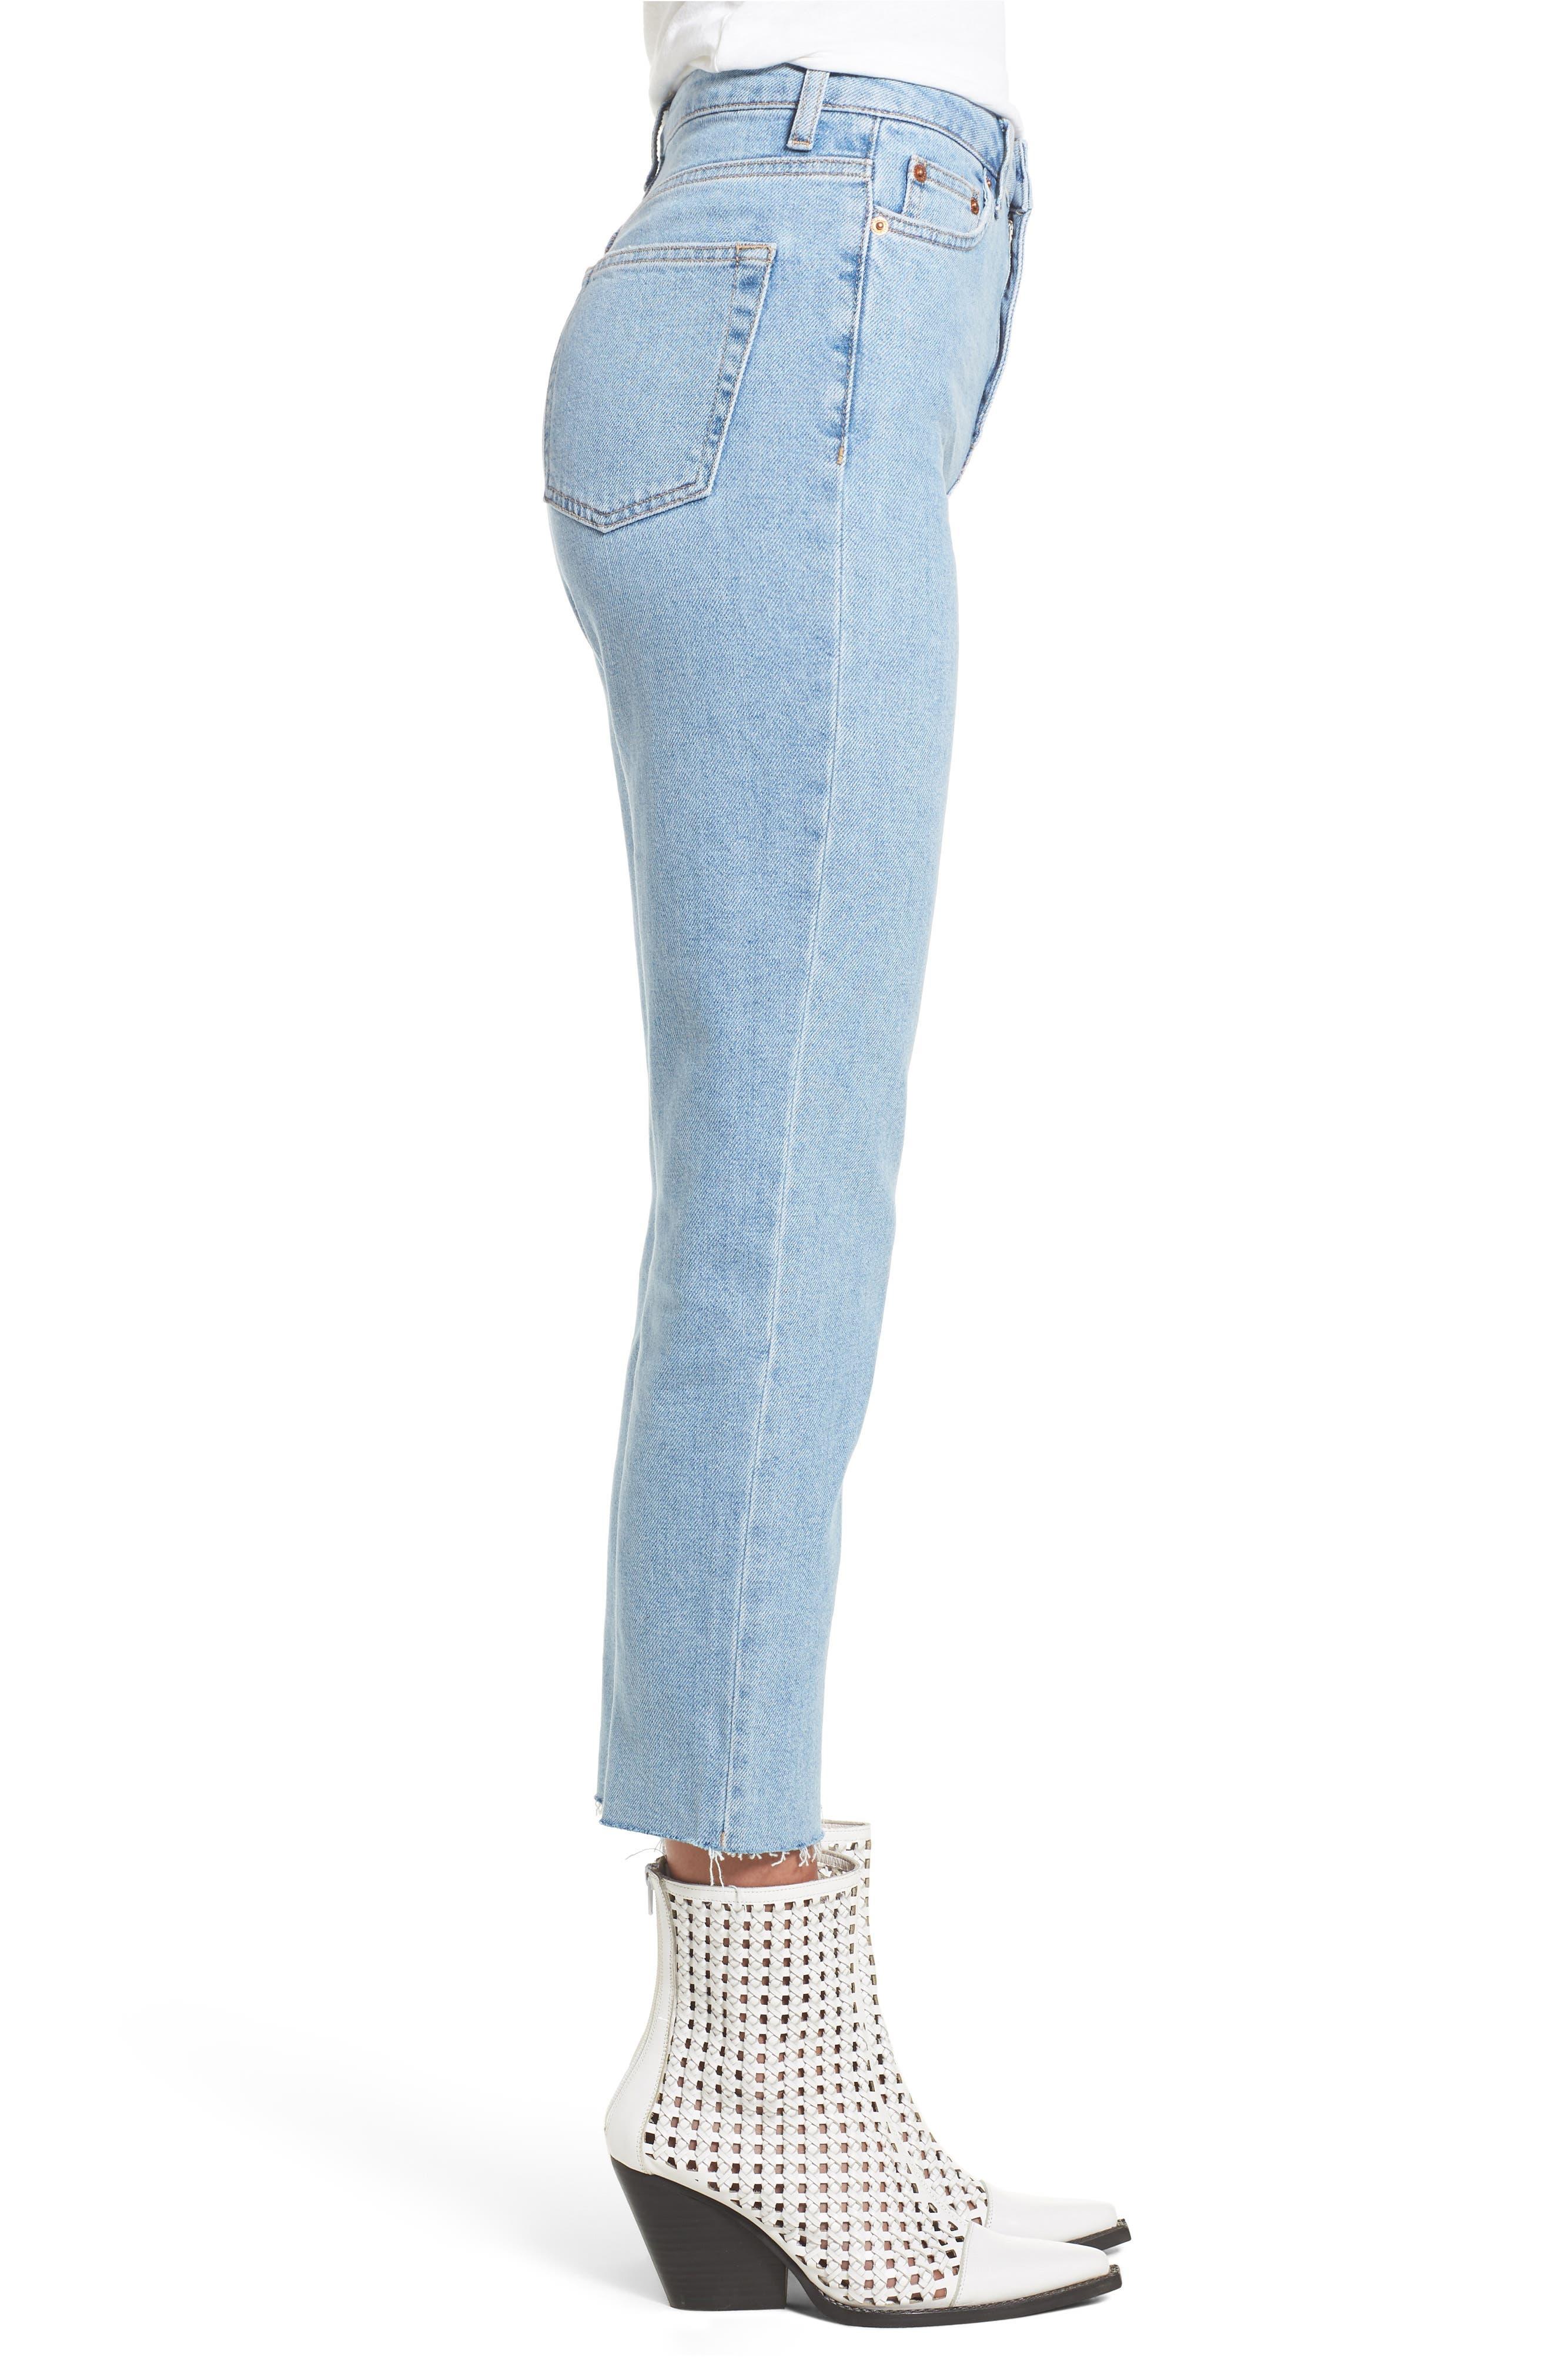 TOPSHOP, Raw Hem Straight Leg Jeans, Alternate thumbnail 4, color, BLEACH STONE DENIM